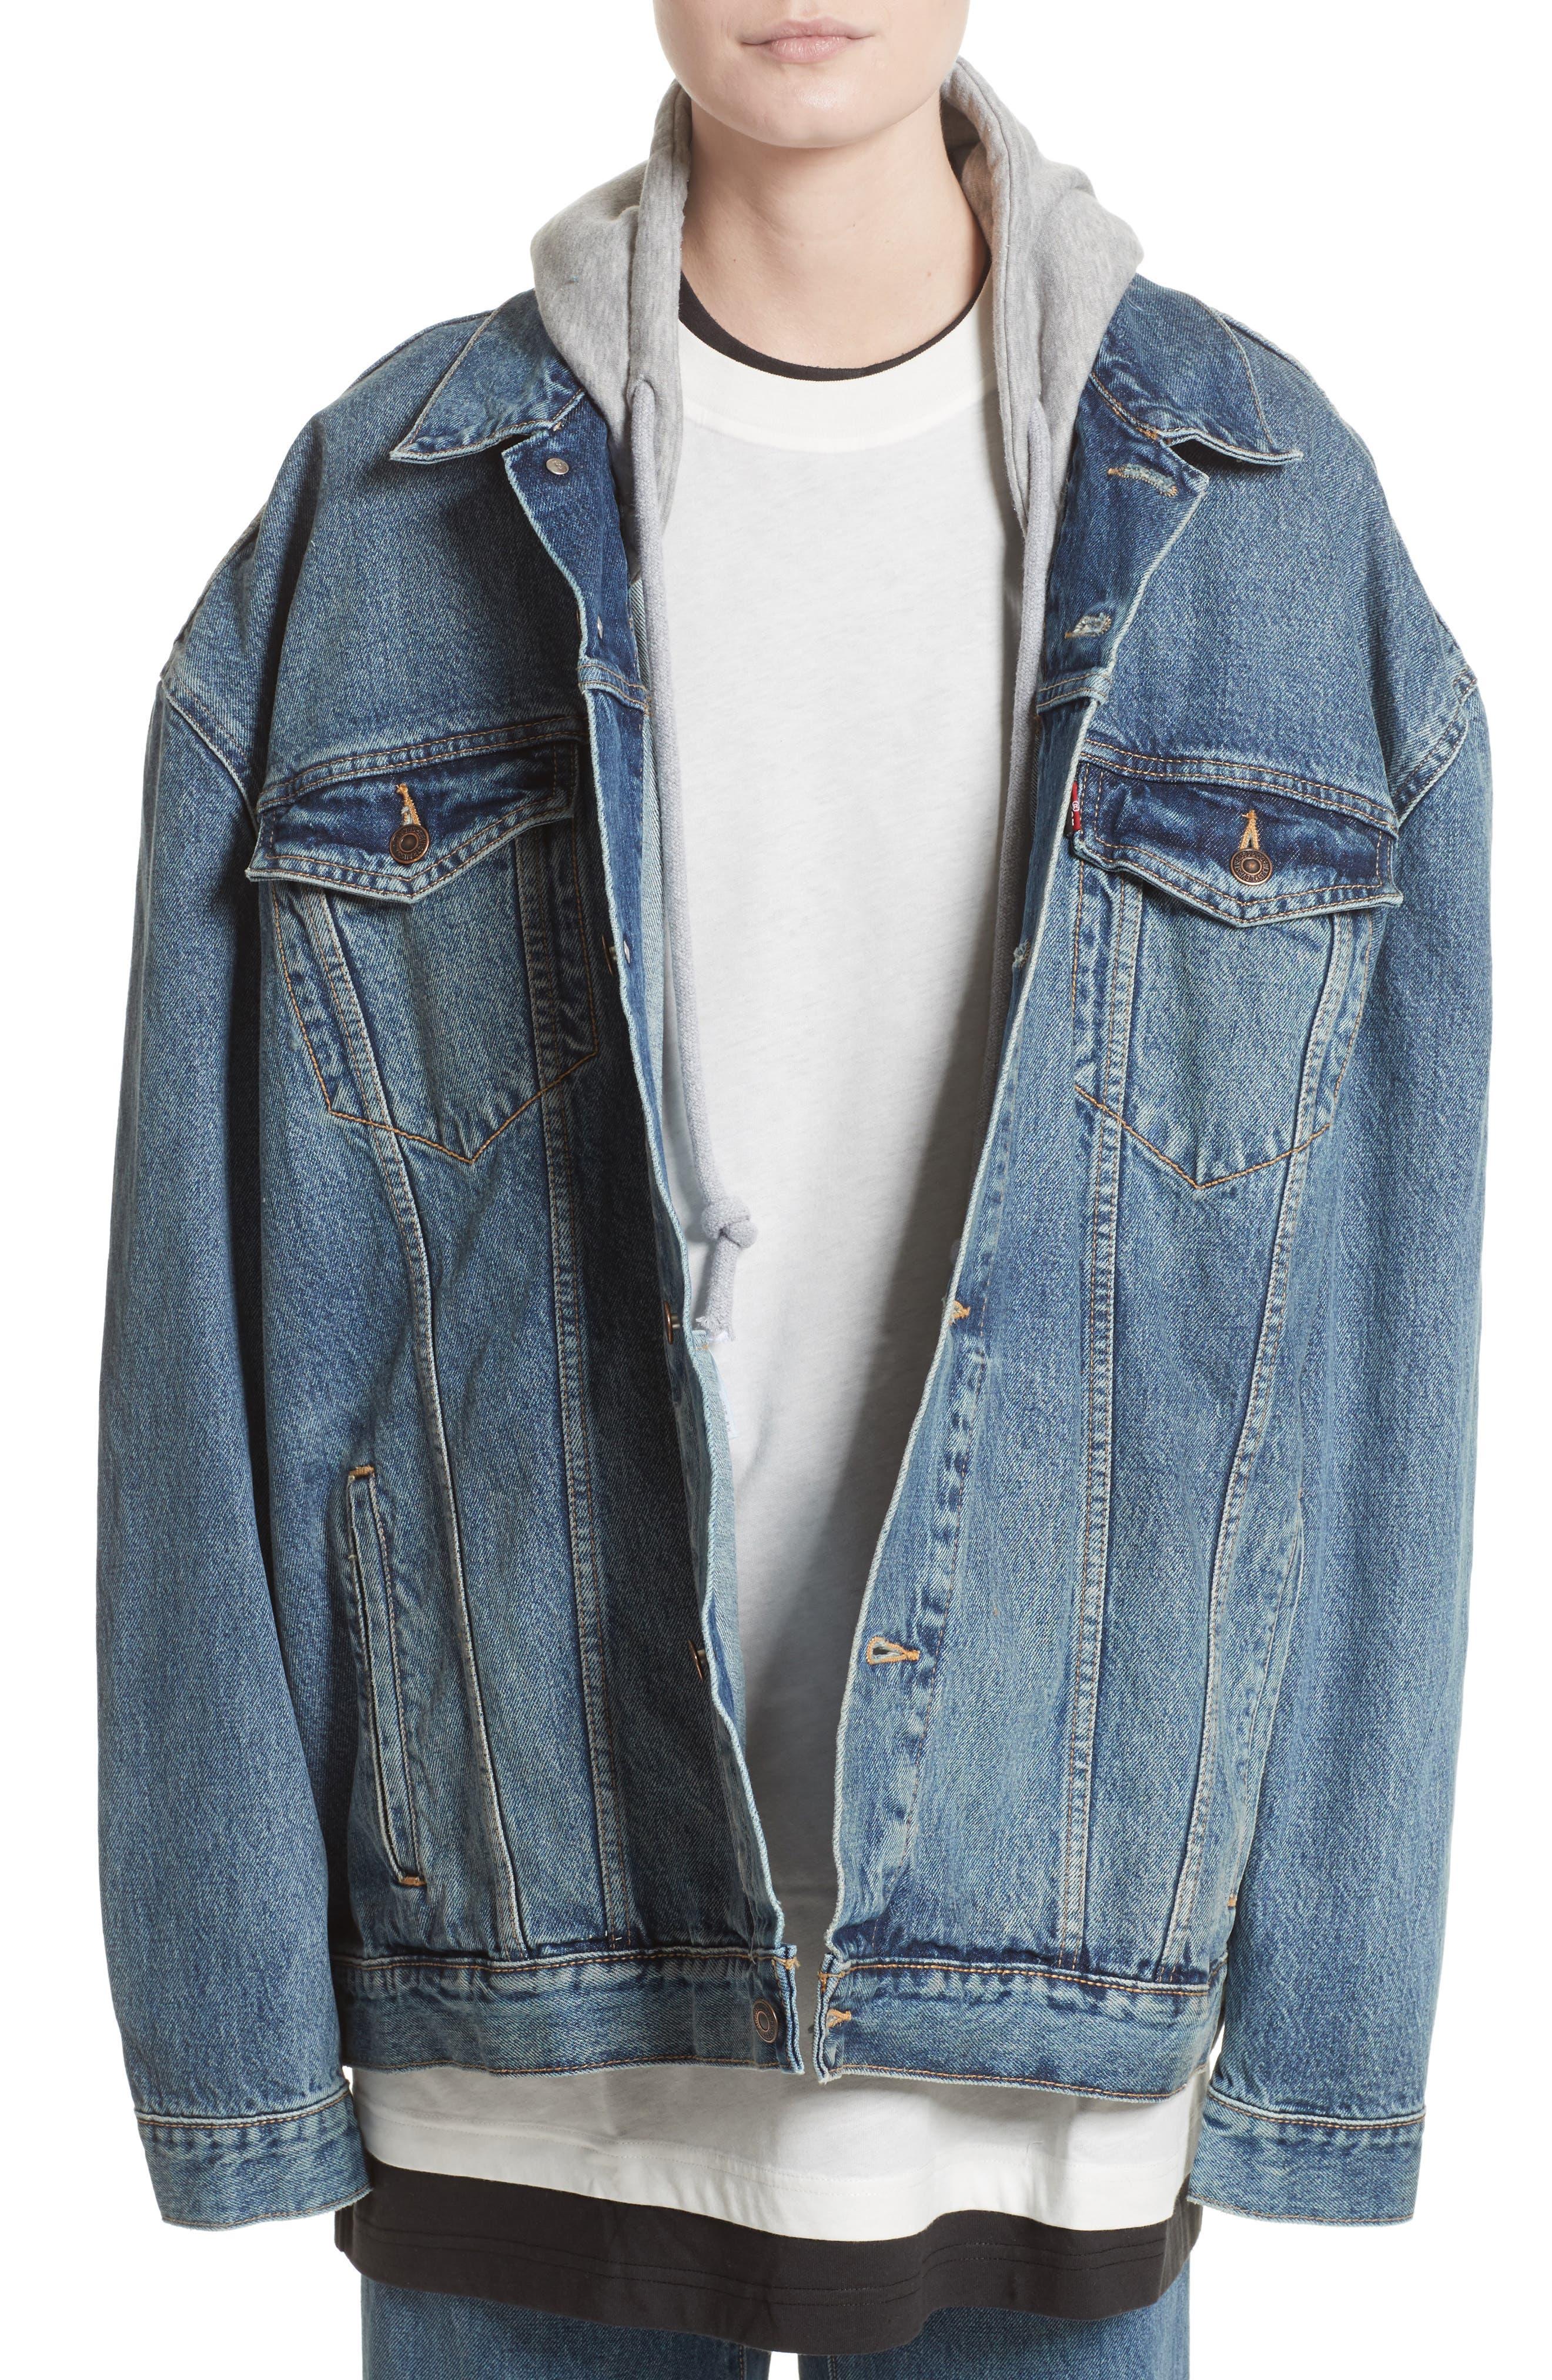 Alternate Image 1 Selected - Vetements x Levi's® Denim Jacket